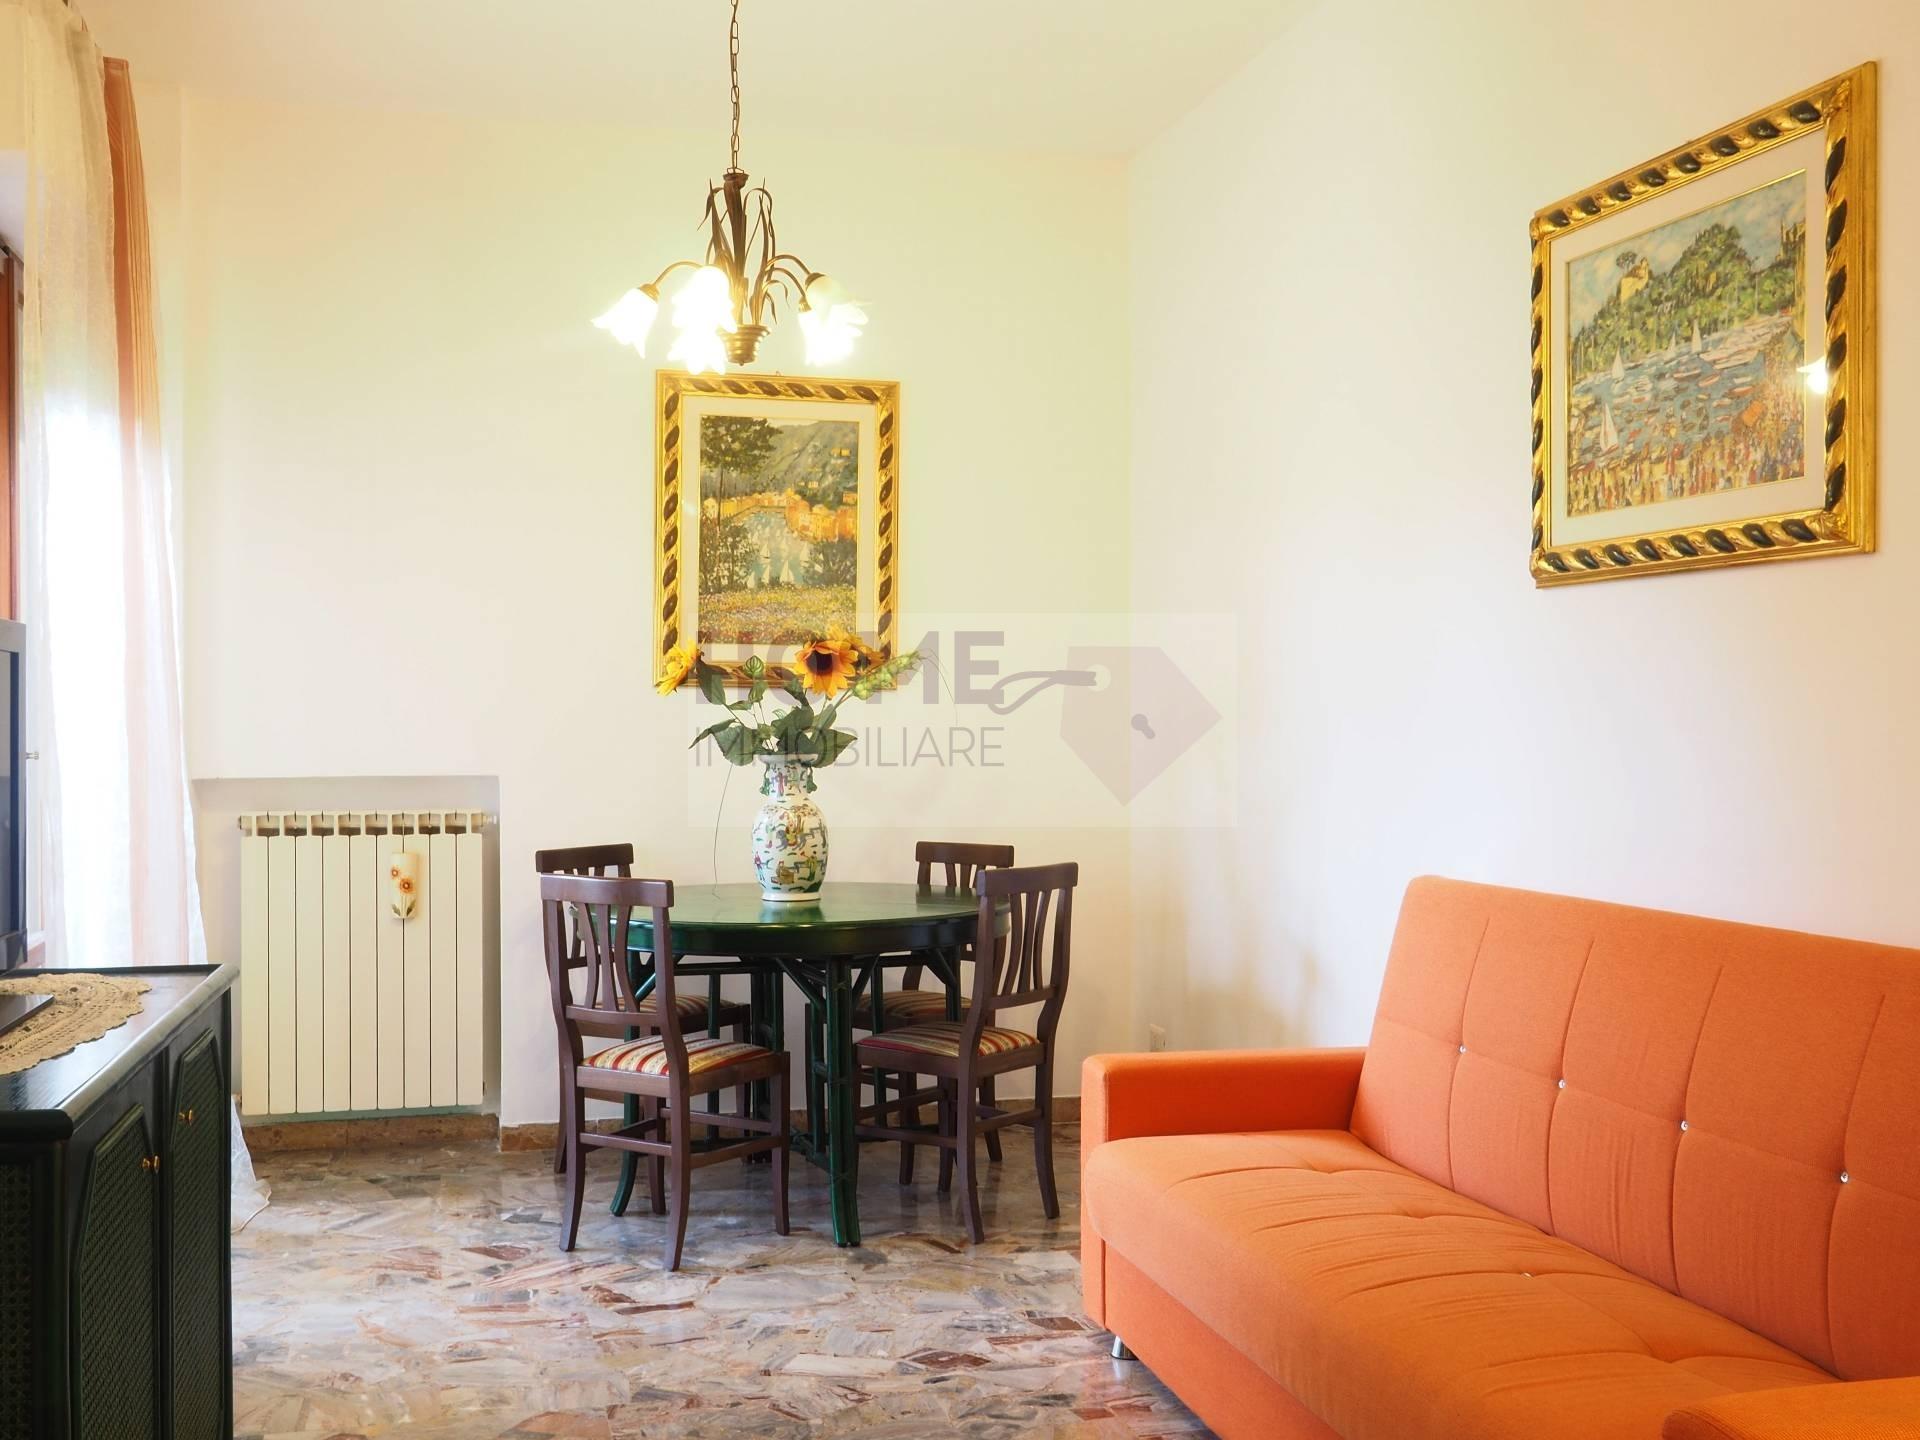 Appartamento, 77 Mq, Affitto - Macerata (Macerata)